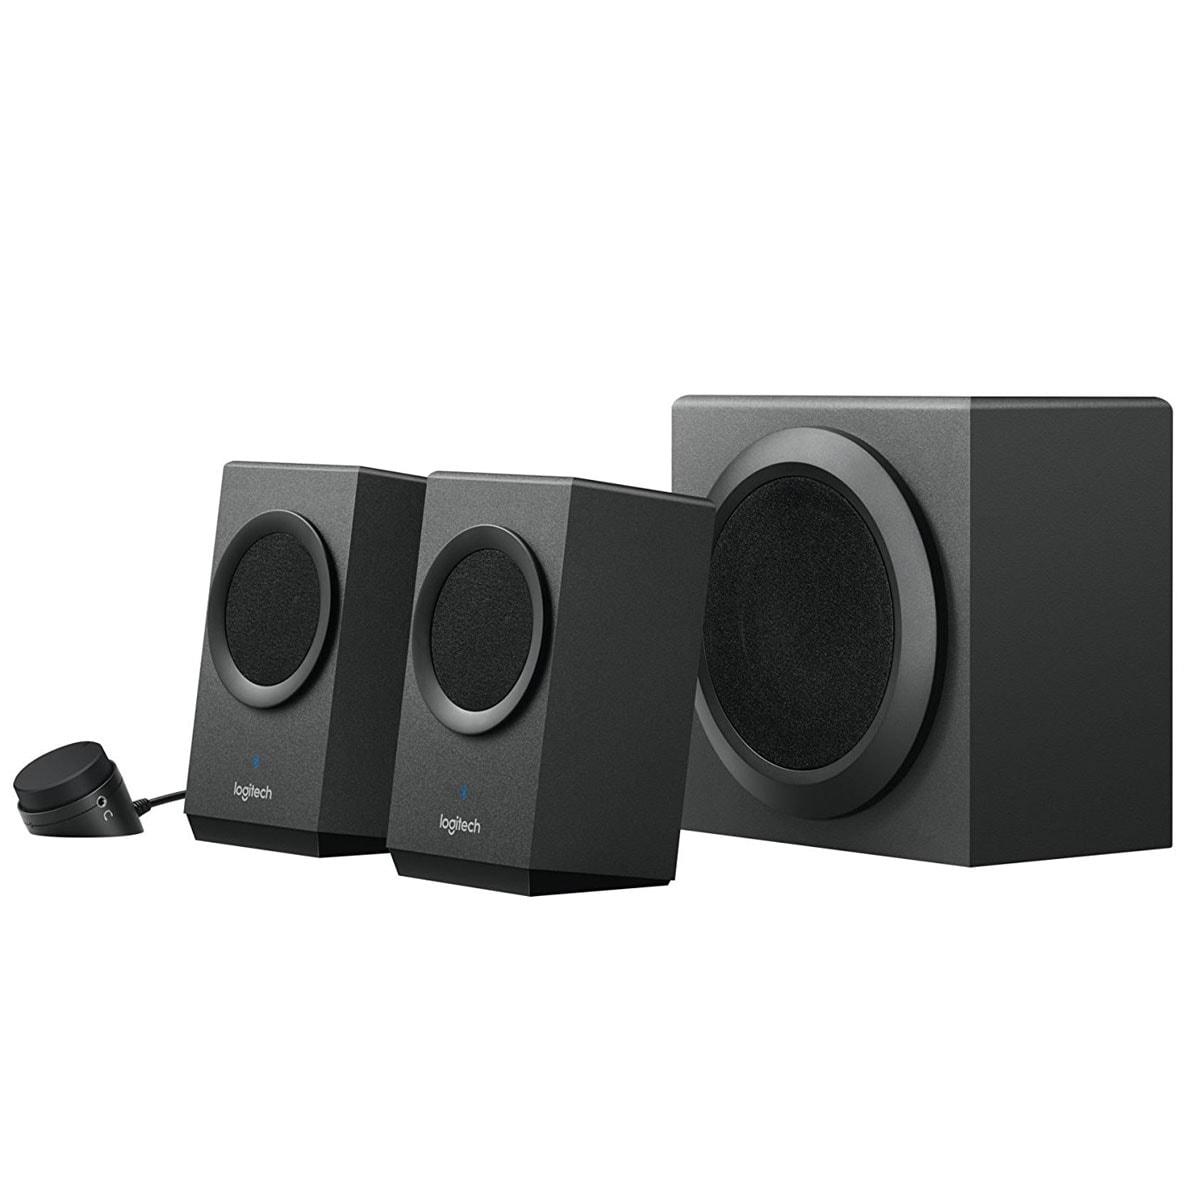 Logitech 2HP+Caisson Z337 Bold Sound - Enceinte PC Logitech - 0